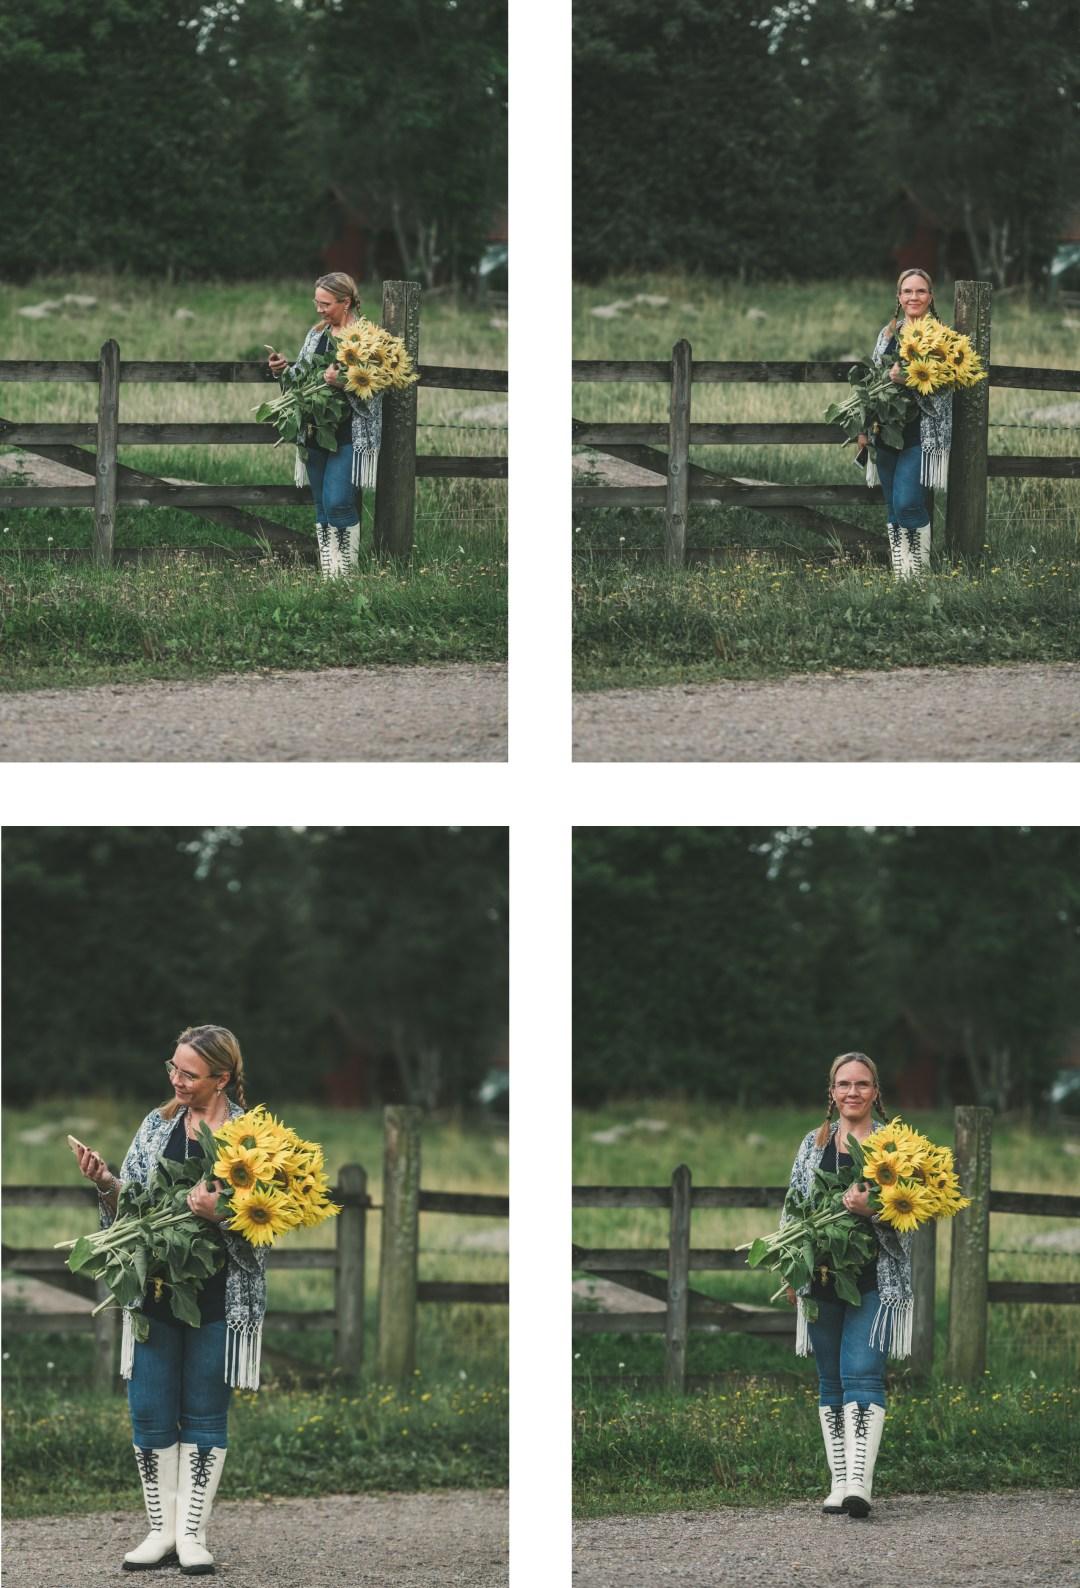 160819_hus30_fotograf_ulrica_hallen_fujifilm_solrosor_xpro2_stillife_lifestyle_sunflowers_autumn-9235